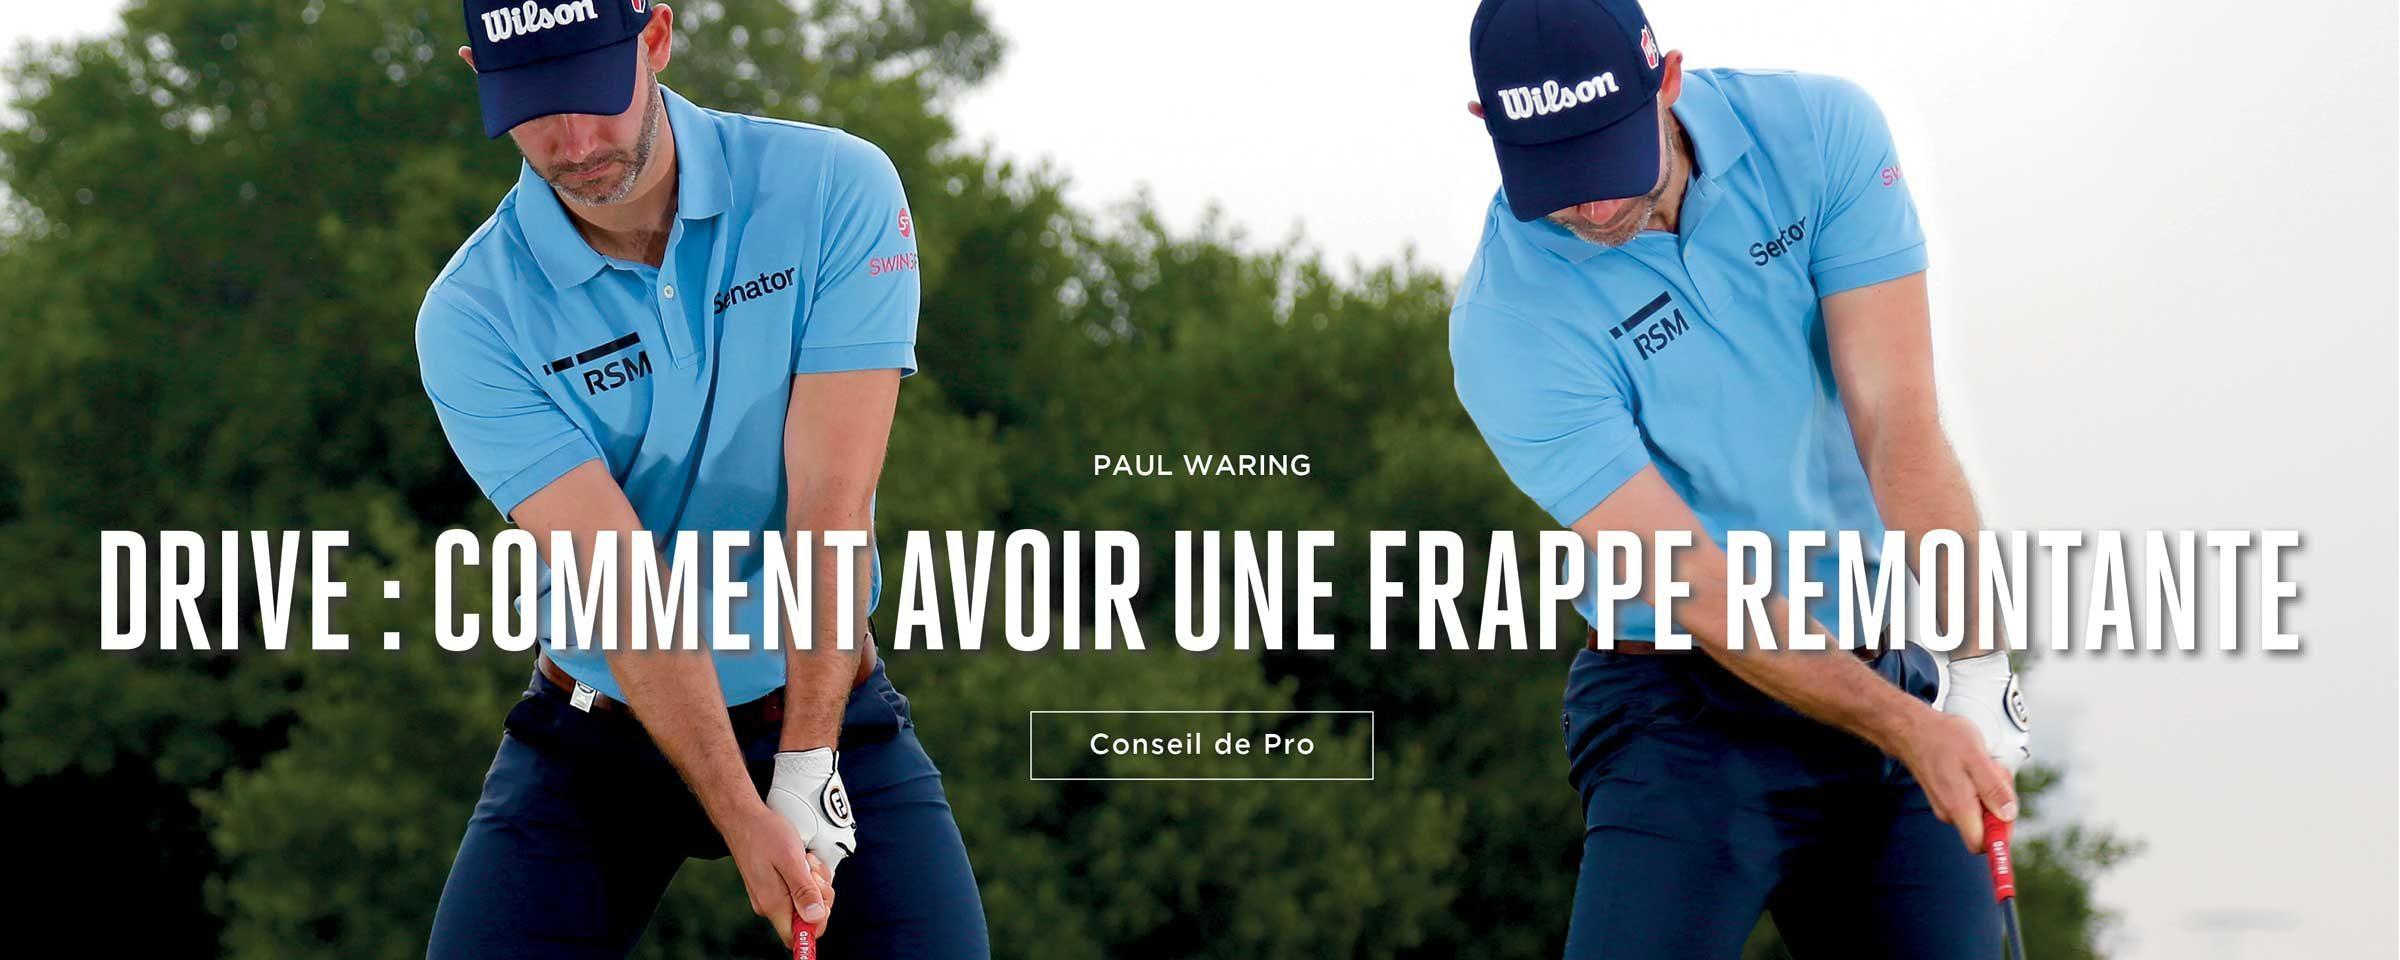 Paul Waring